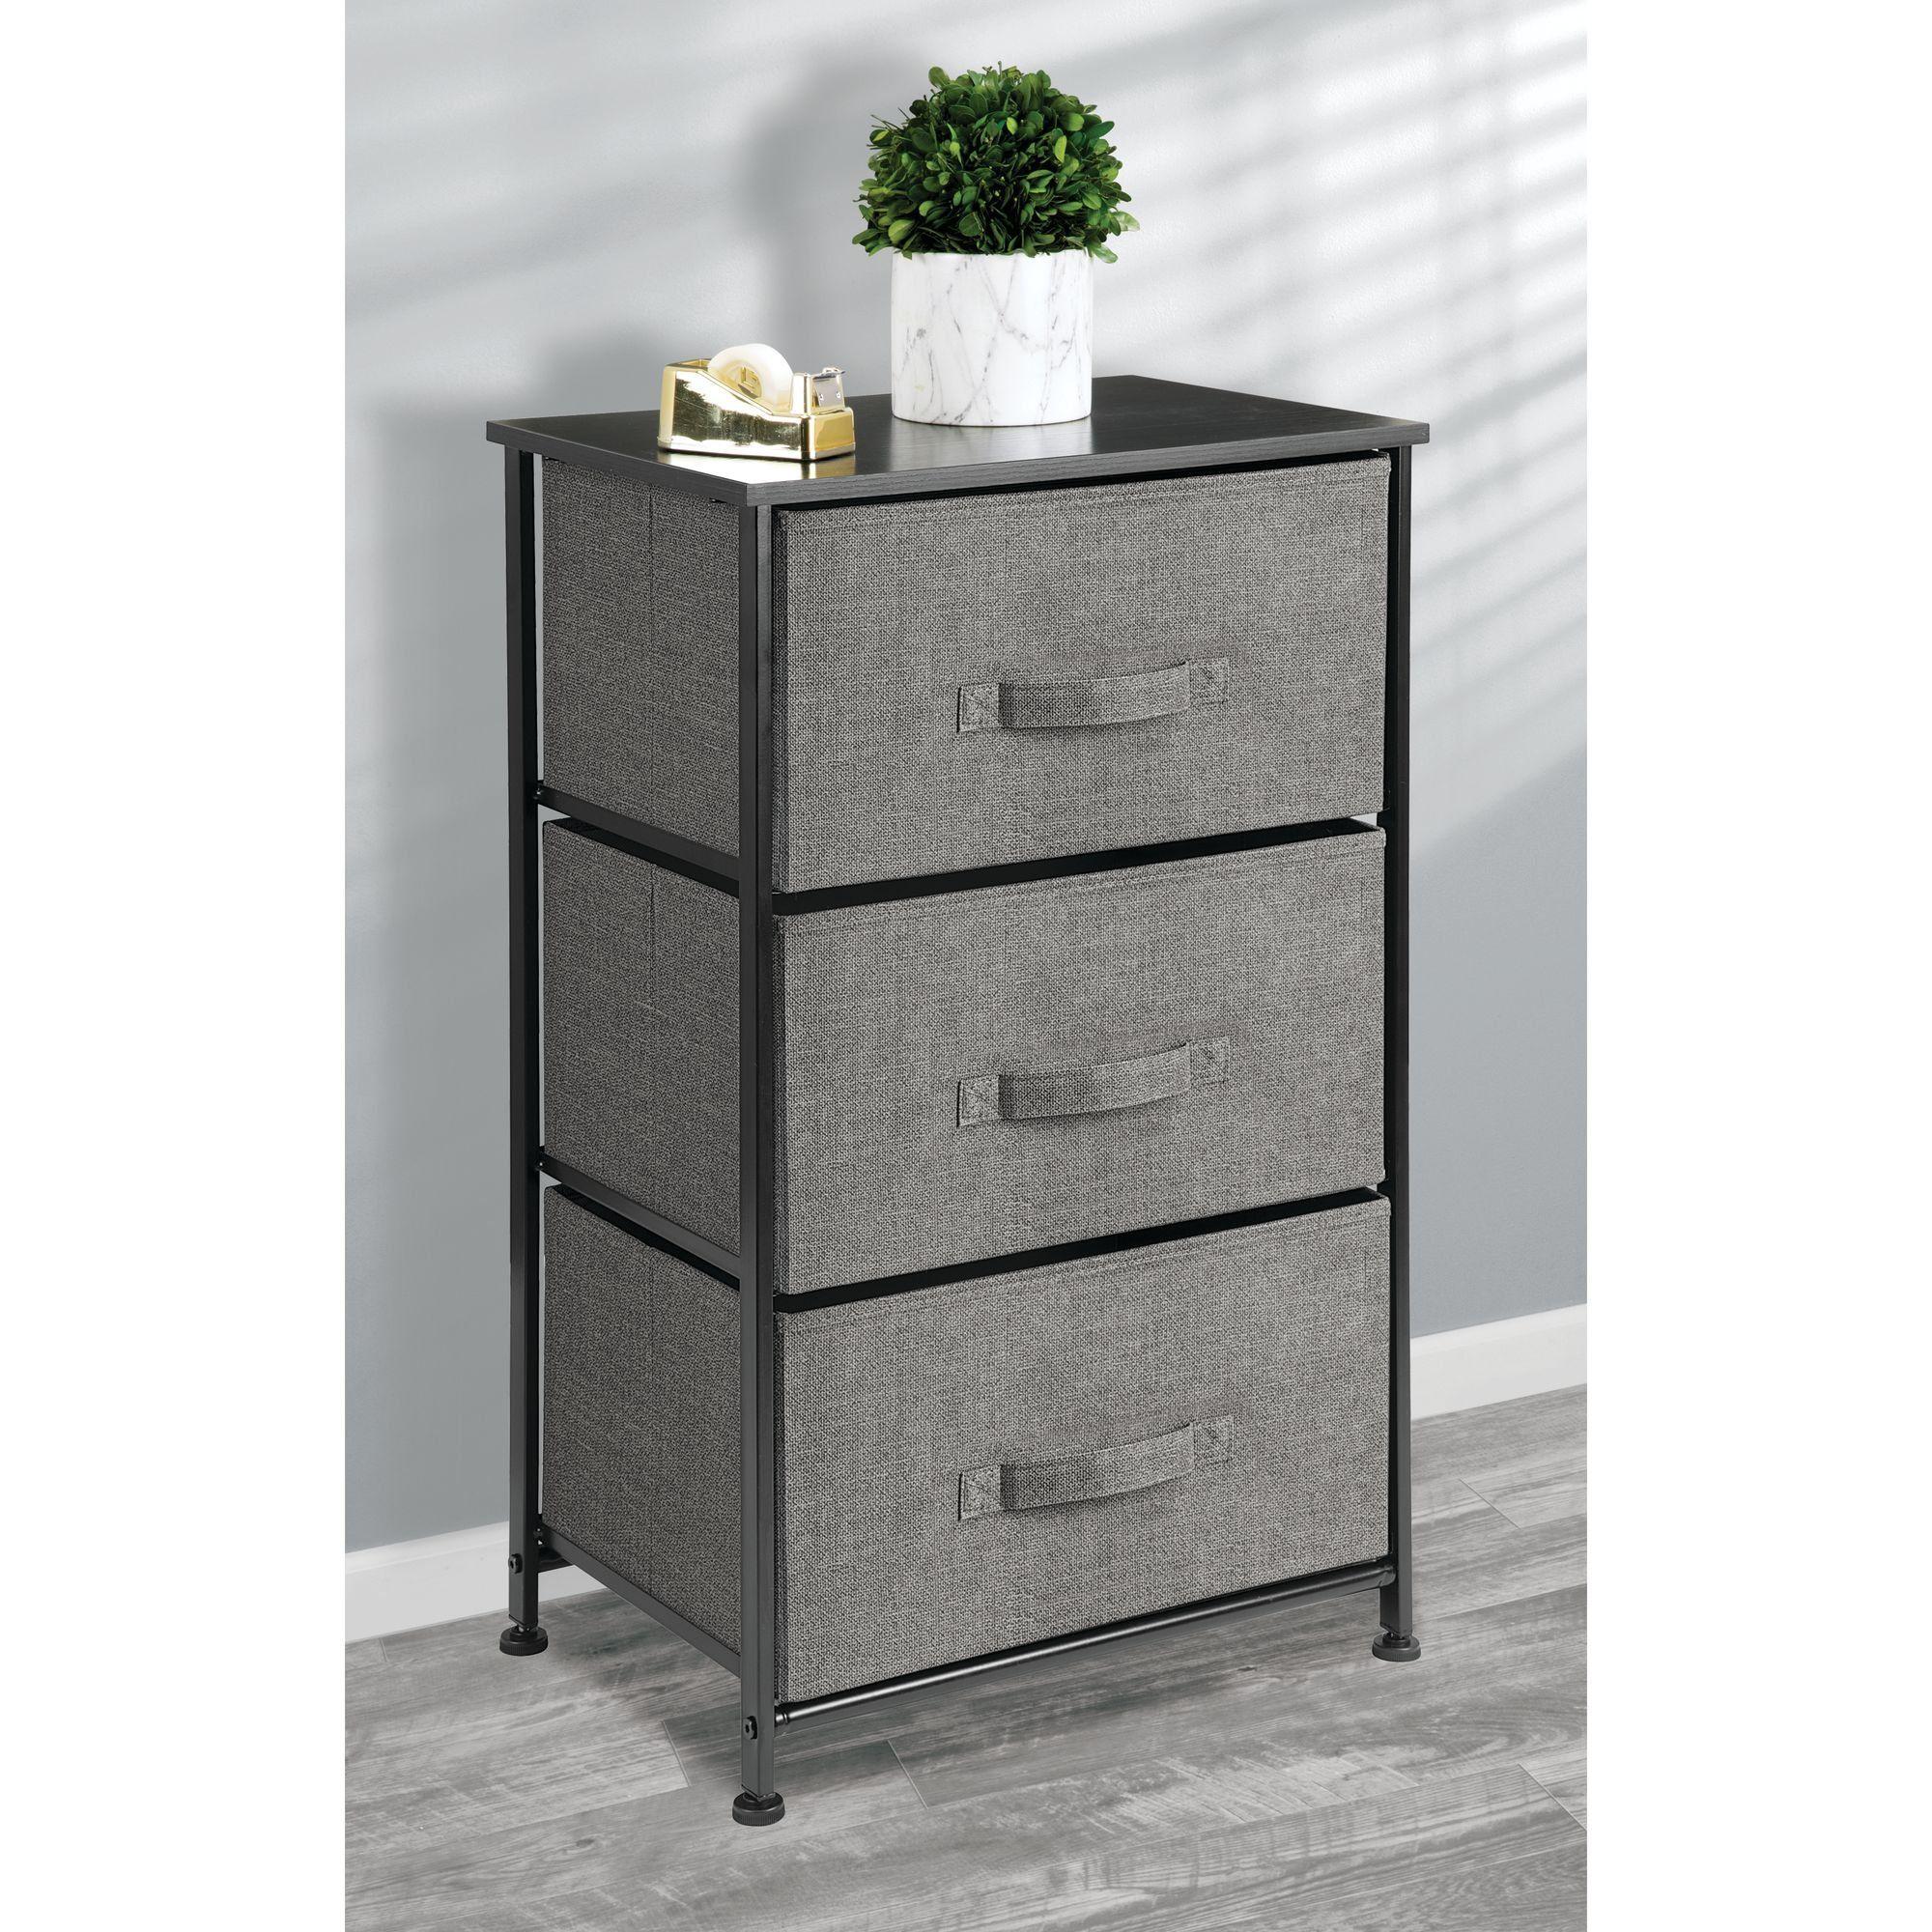 drawer of inspirational rubbermaid knife plastic kitchen bedroom organizer desk organizers white storage drawers mudroom block